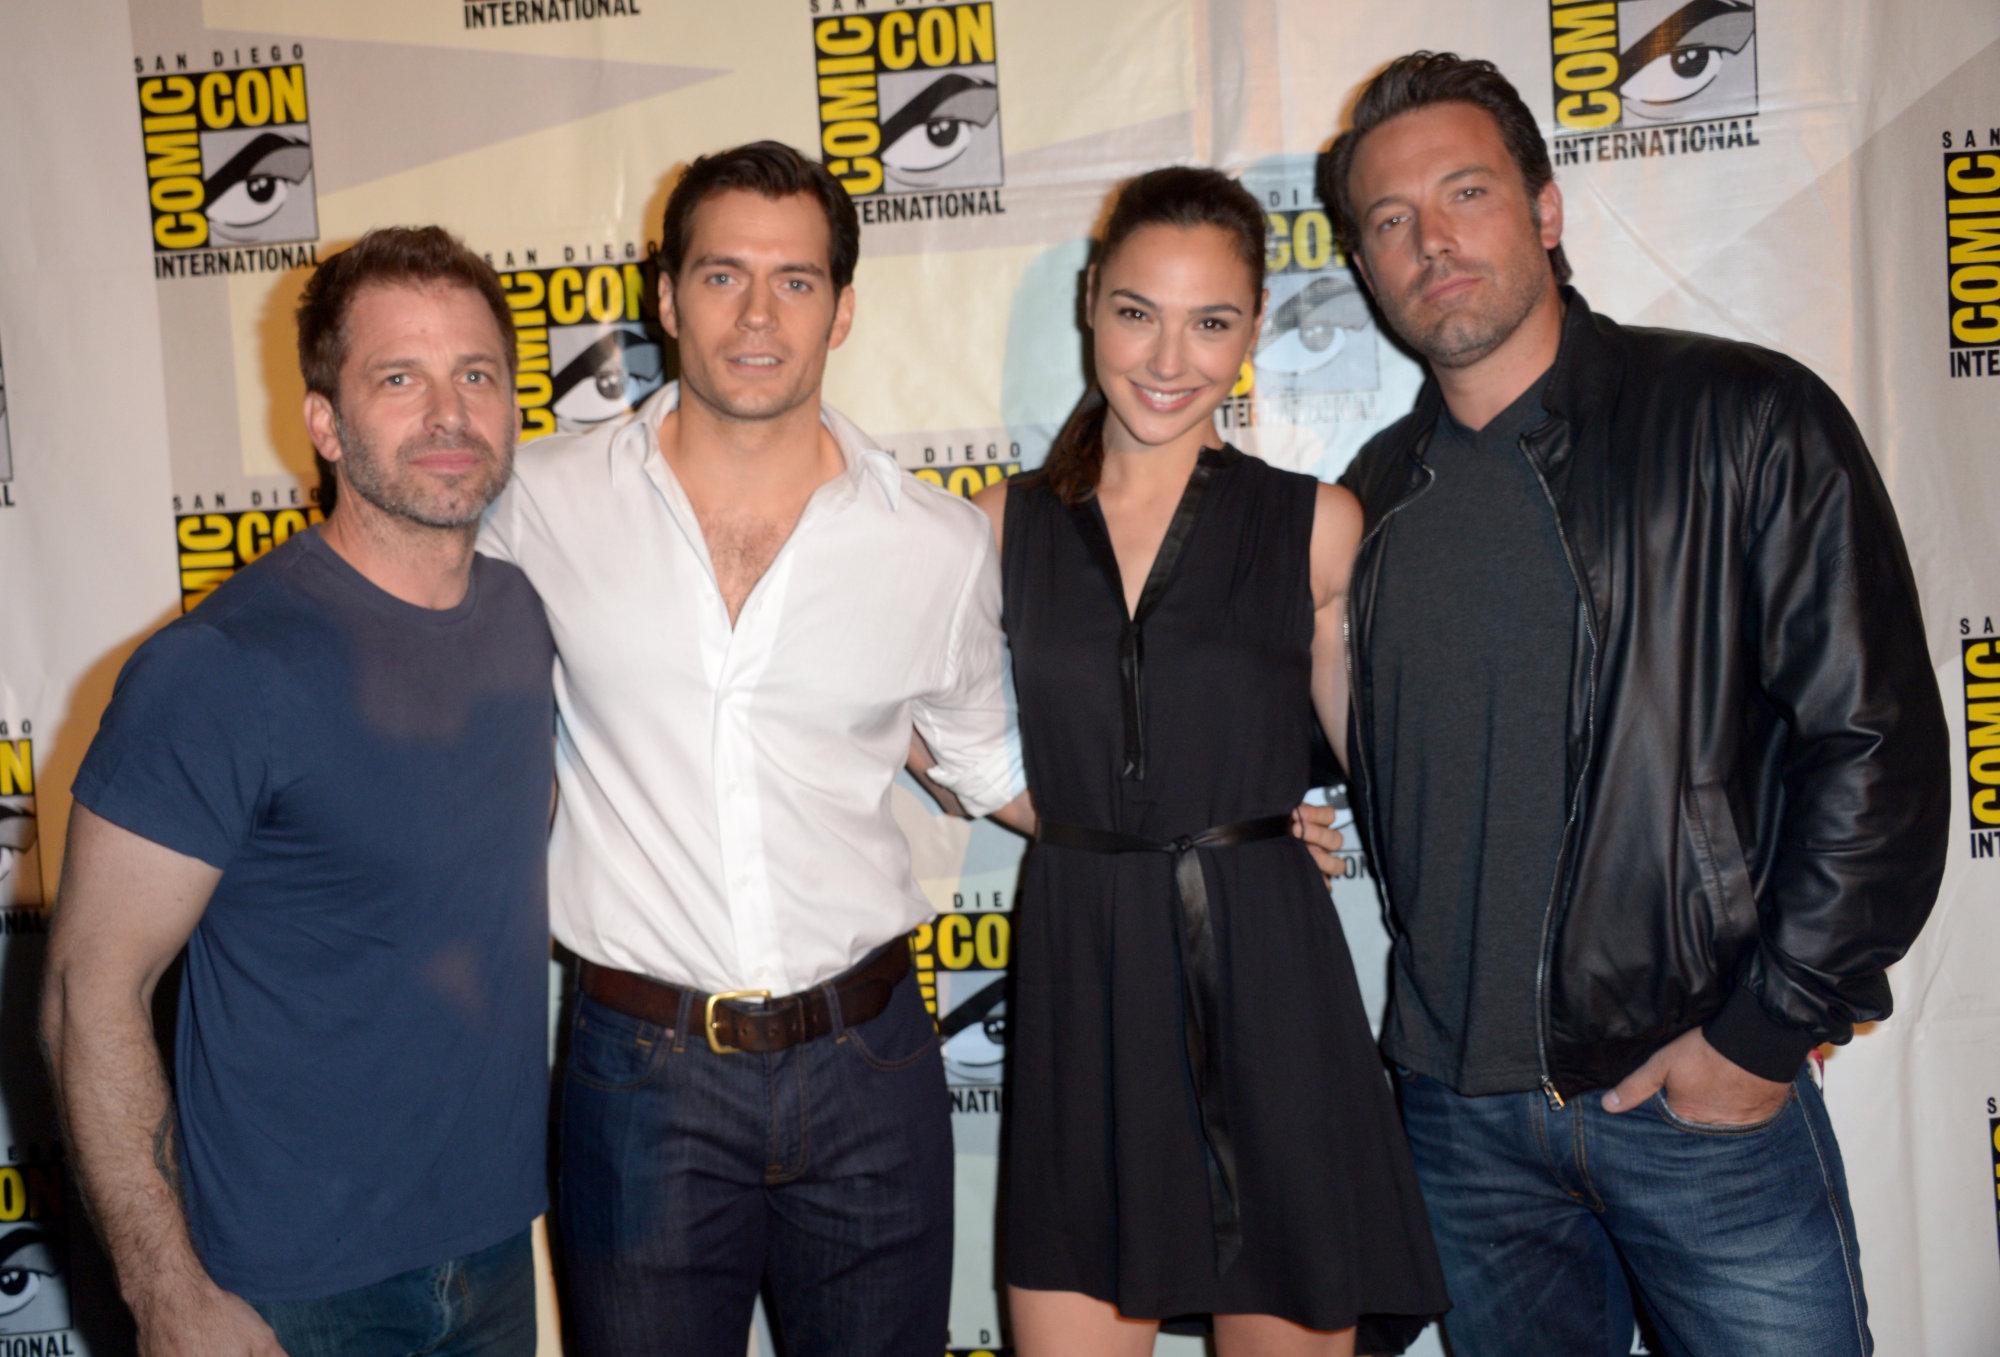 Zack Snyder Henry Cavill Gal Gadot And Ben Affleck